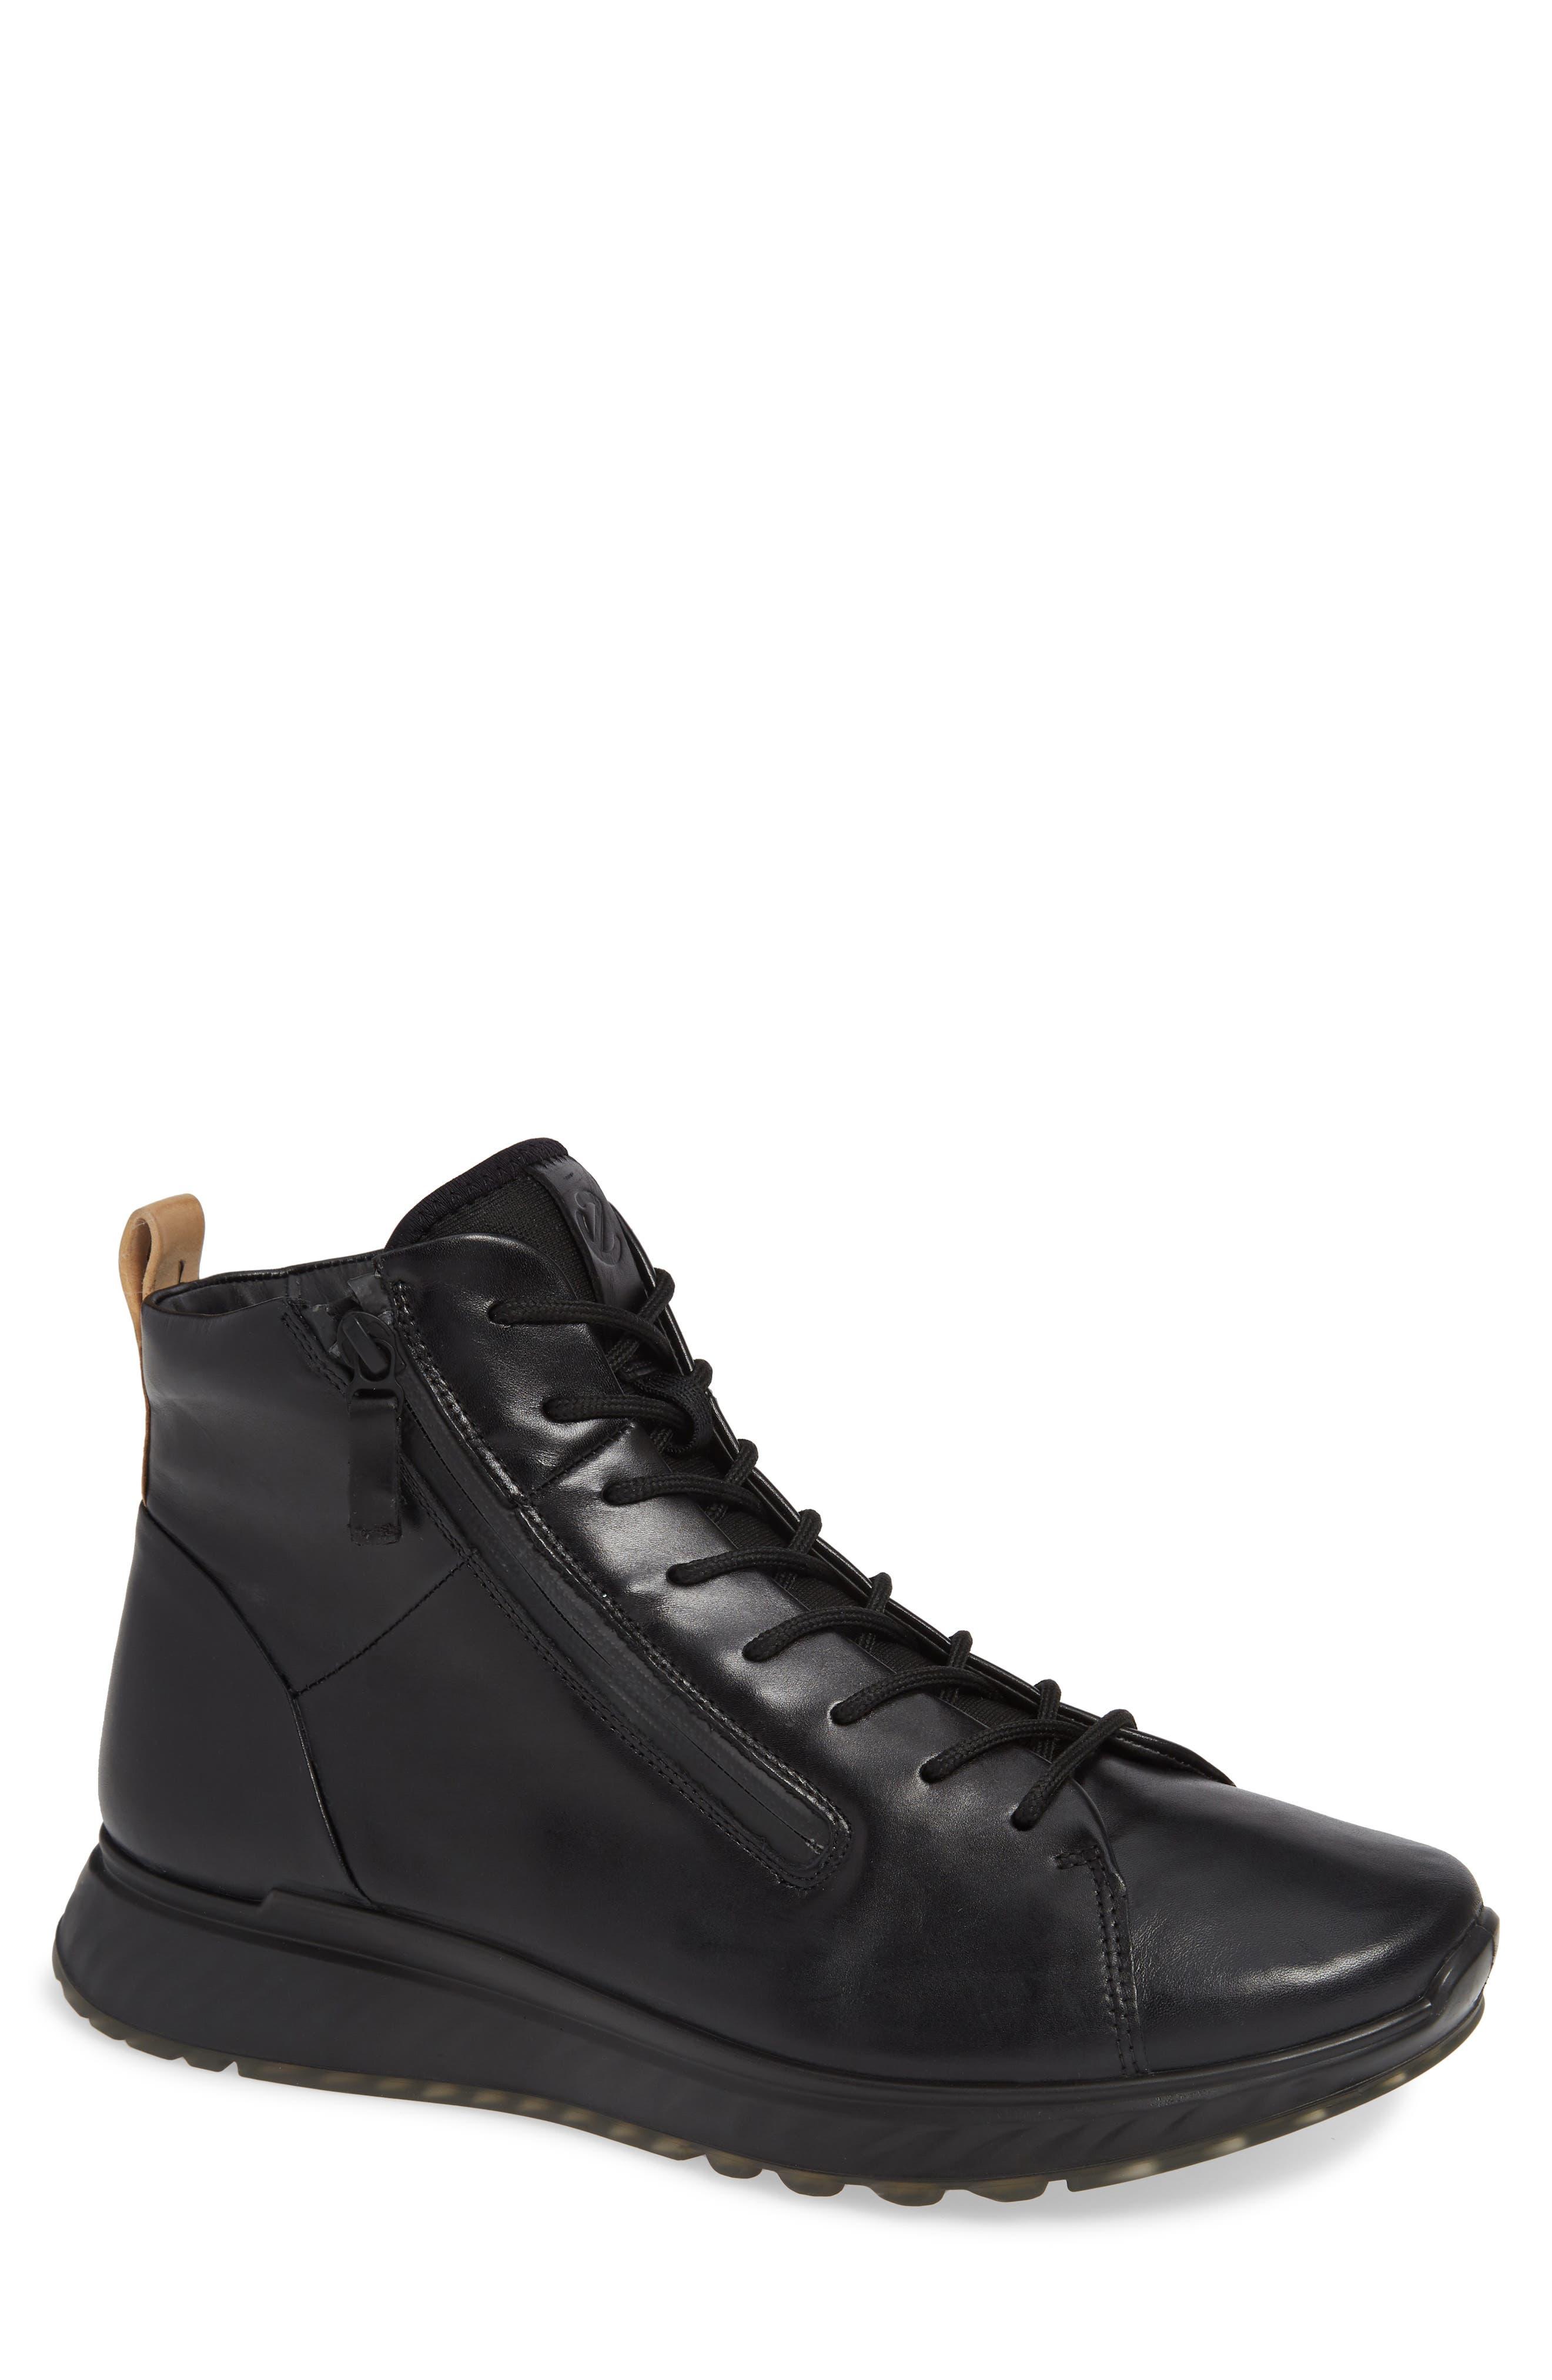 ST1 High Top Sneaker,                             Main thumbnail 1, color,                             BLACK/BLACK LEATHER